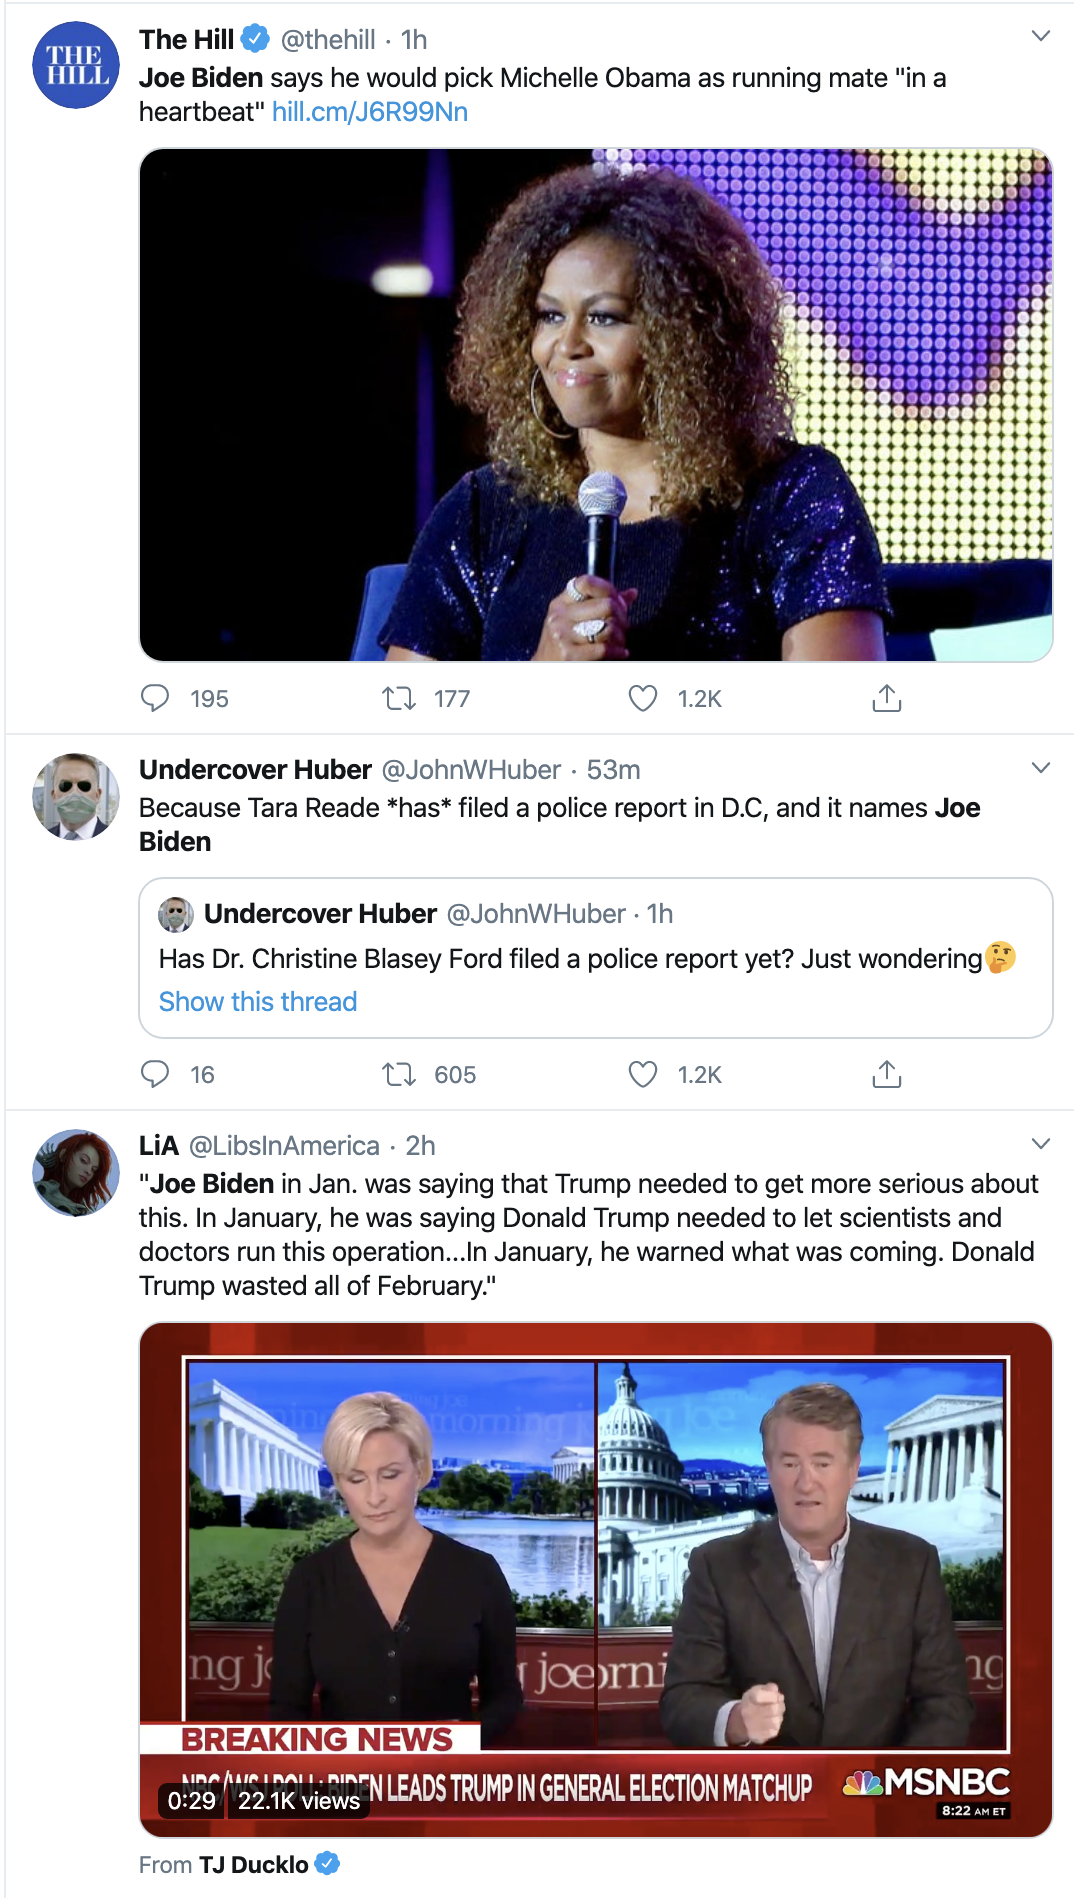 Screen-Shot-2020-04-21-at-8.39.51-AM Joe Biden Makes Tuesday Obama VP Announcement Donald Trump Election 2020 Featured Politics Top Stories